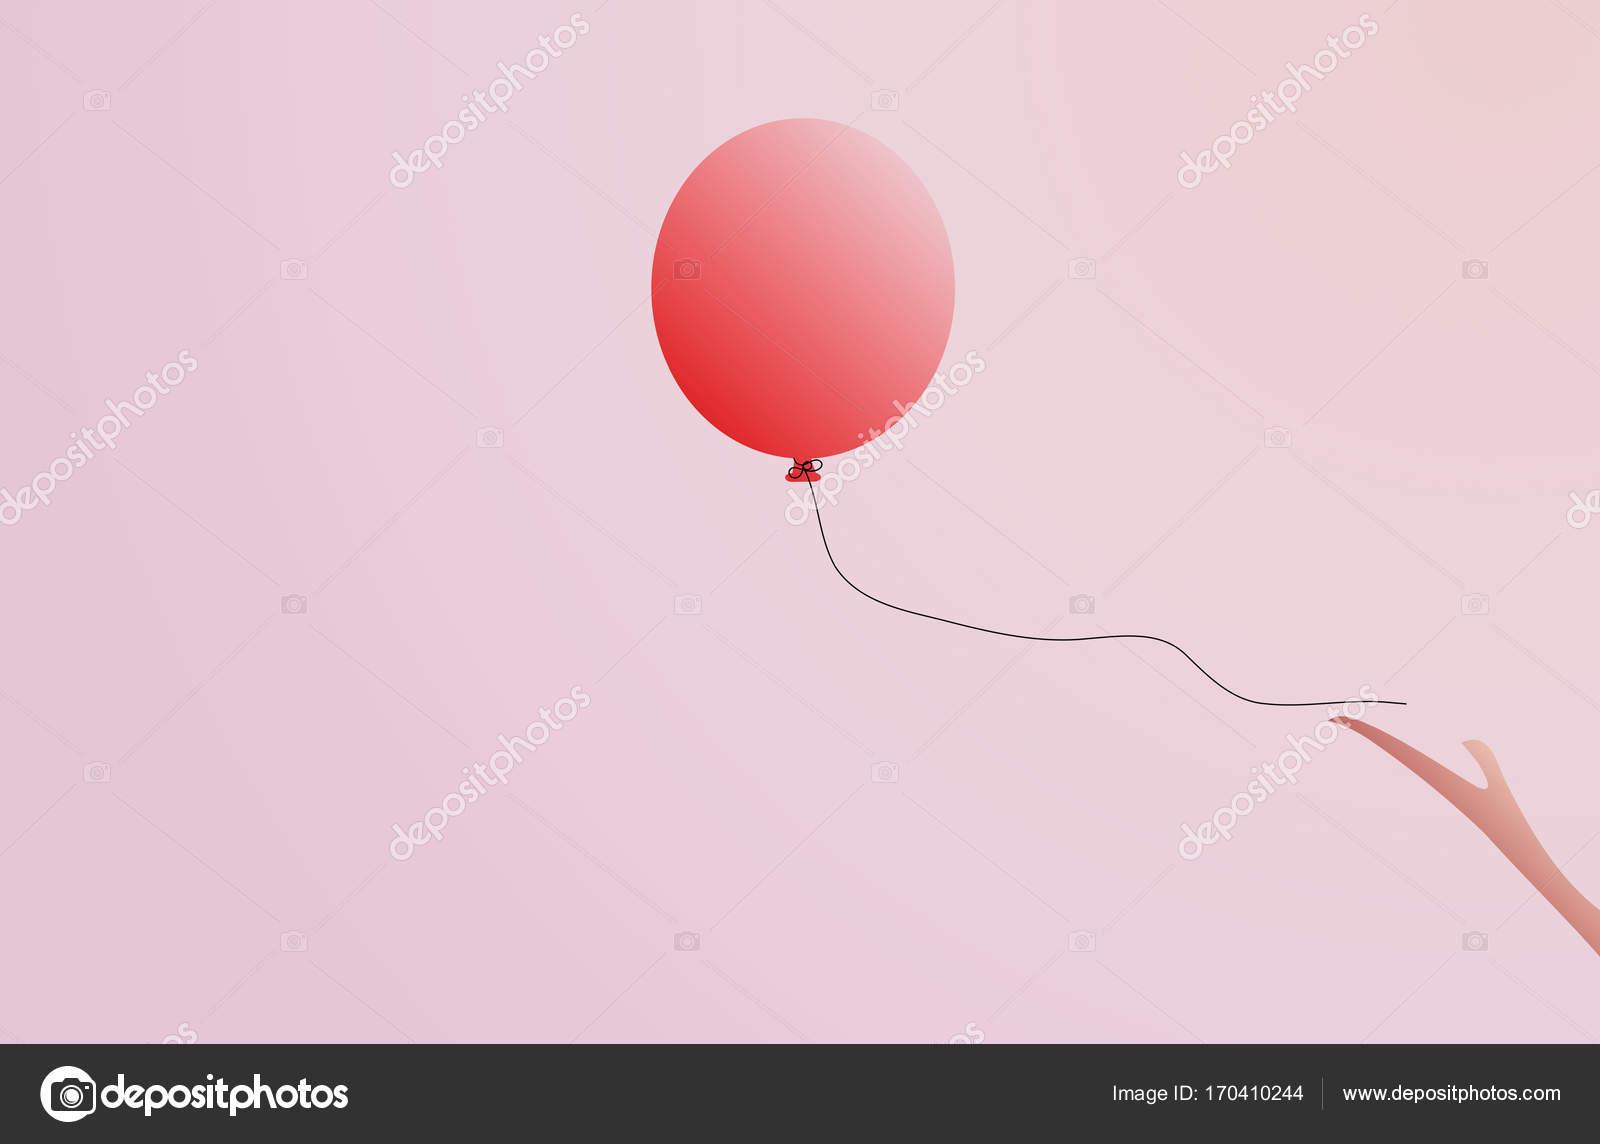 Roze Ballon Grote Ronde Roze Ballon Met Lange Lint Glanzende